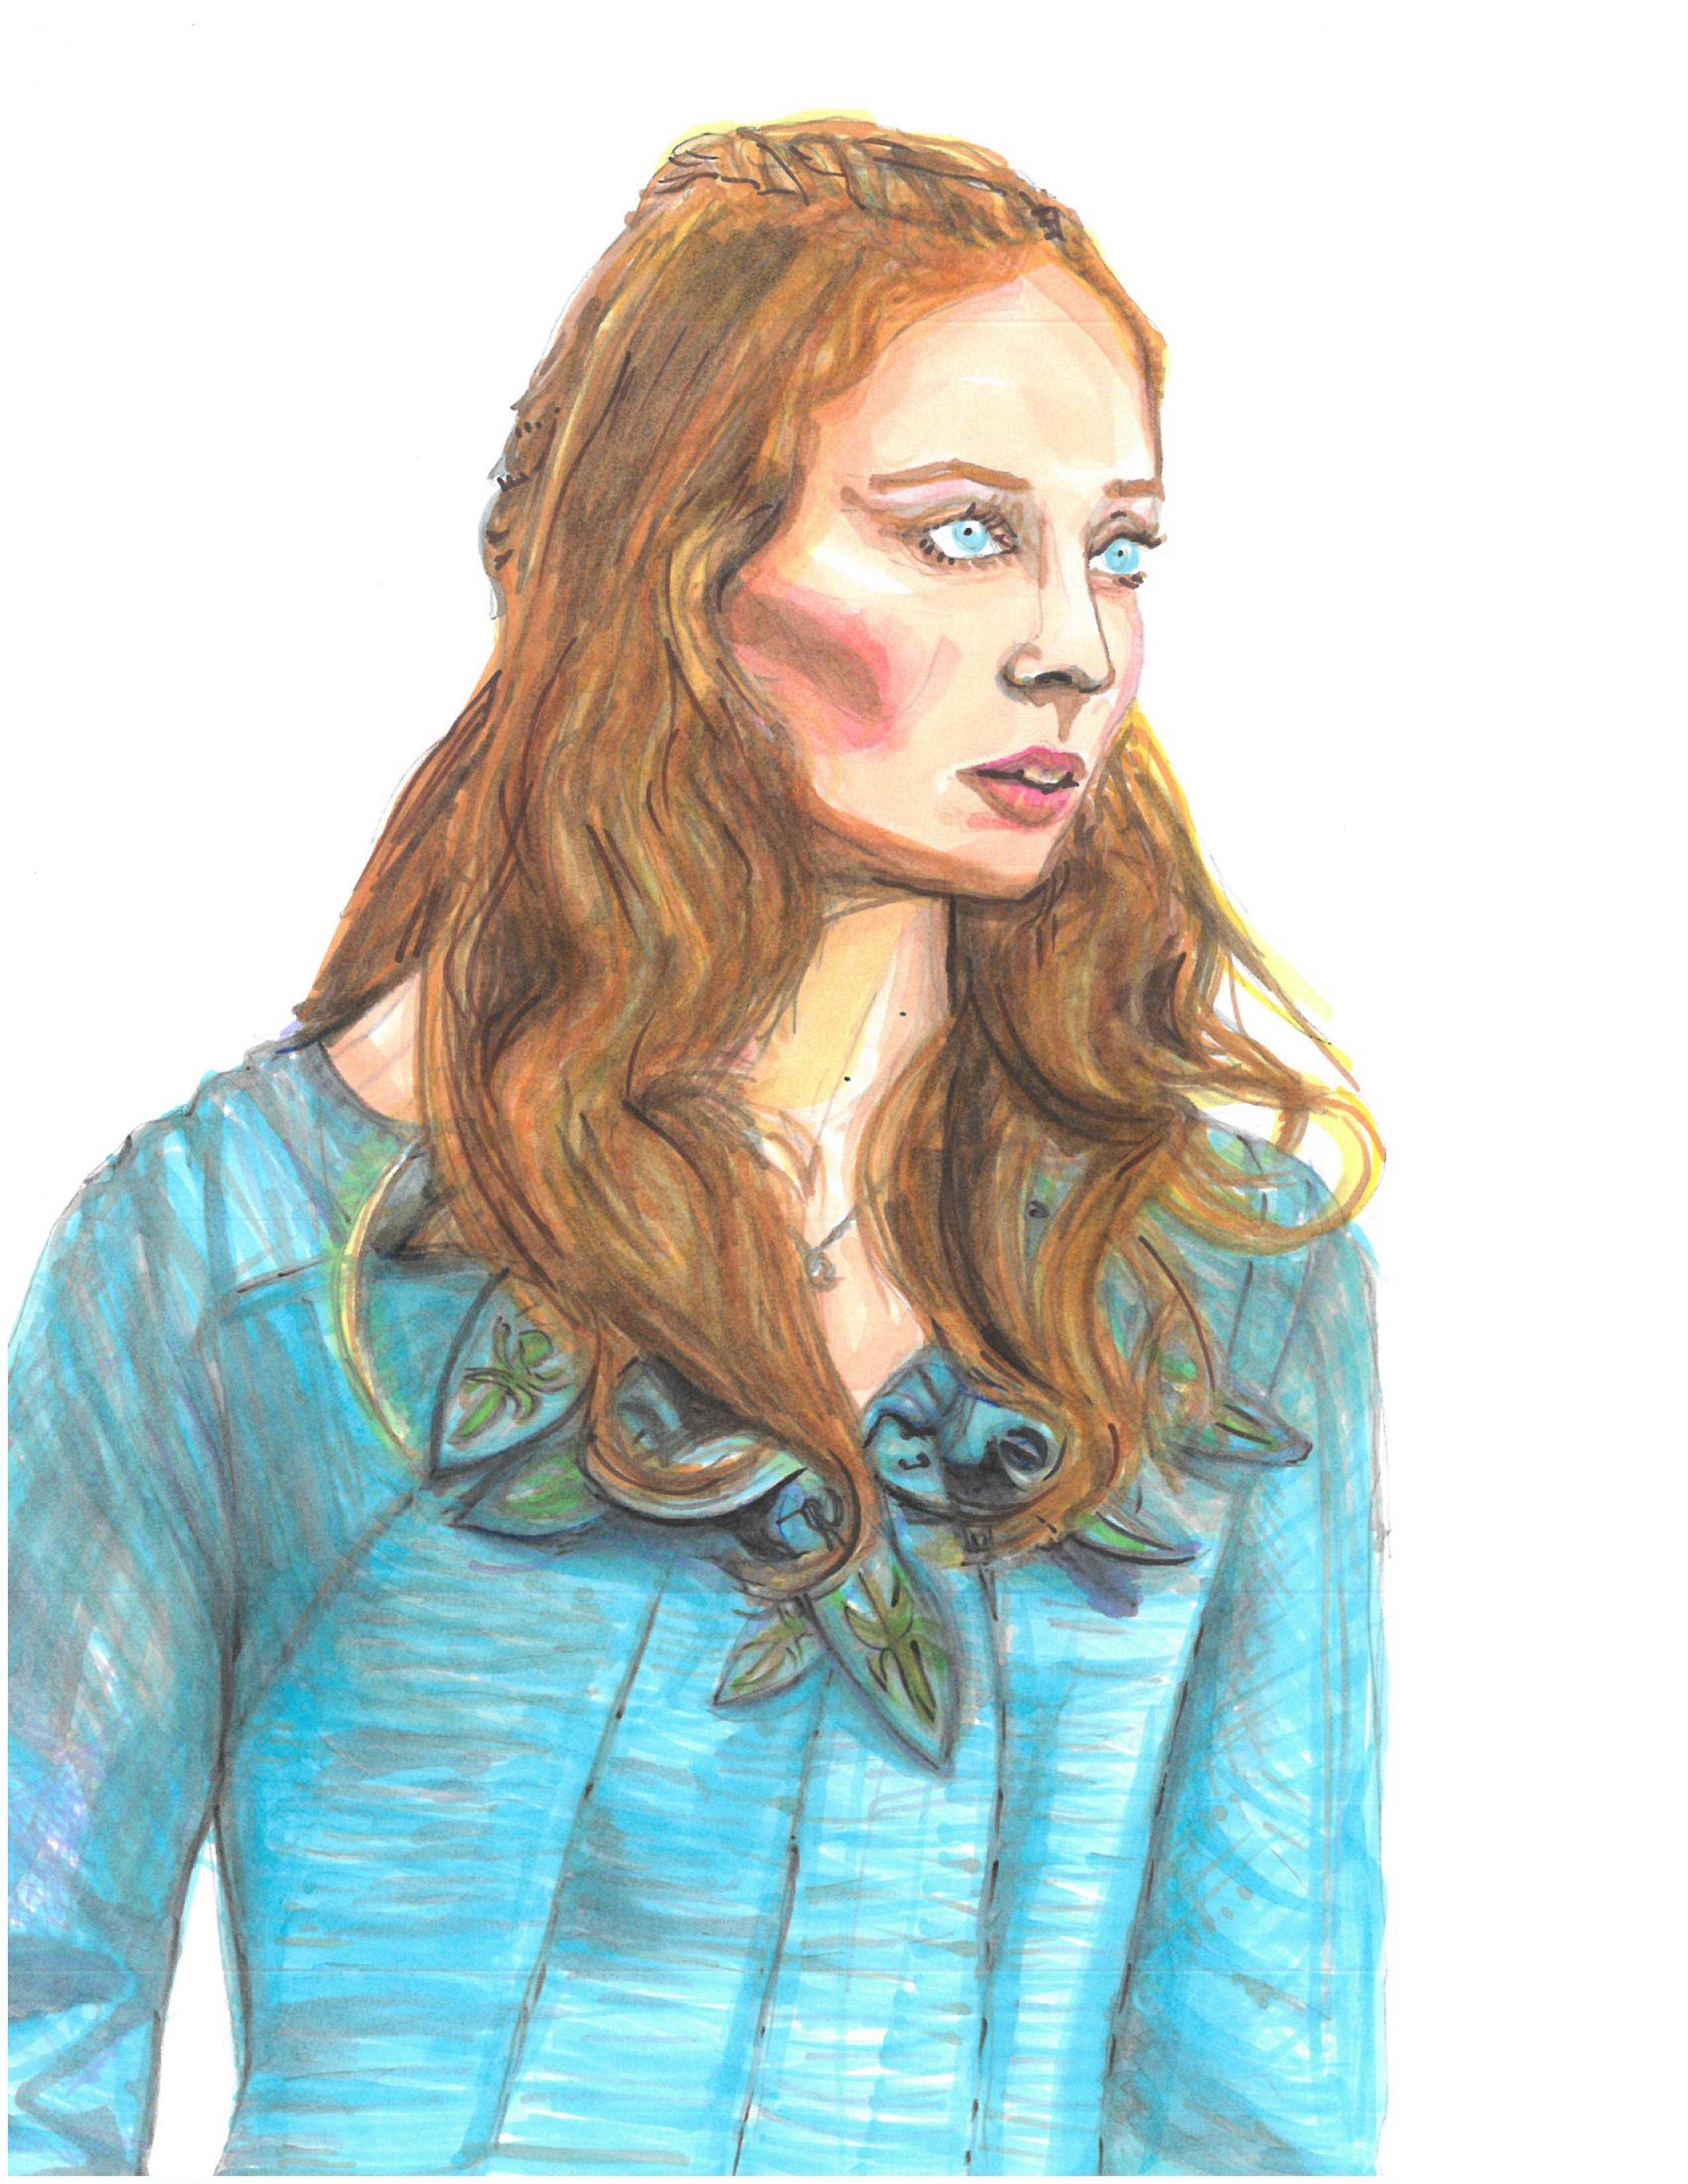 tessa dines drawing of sansa young.jpg